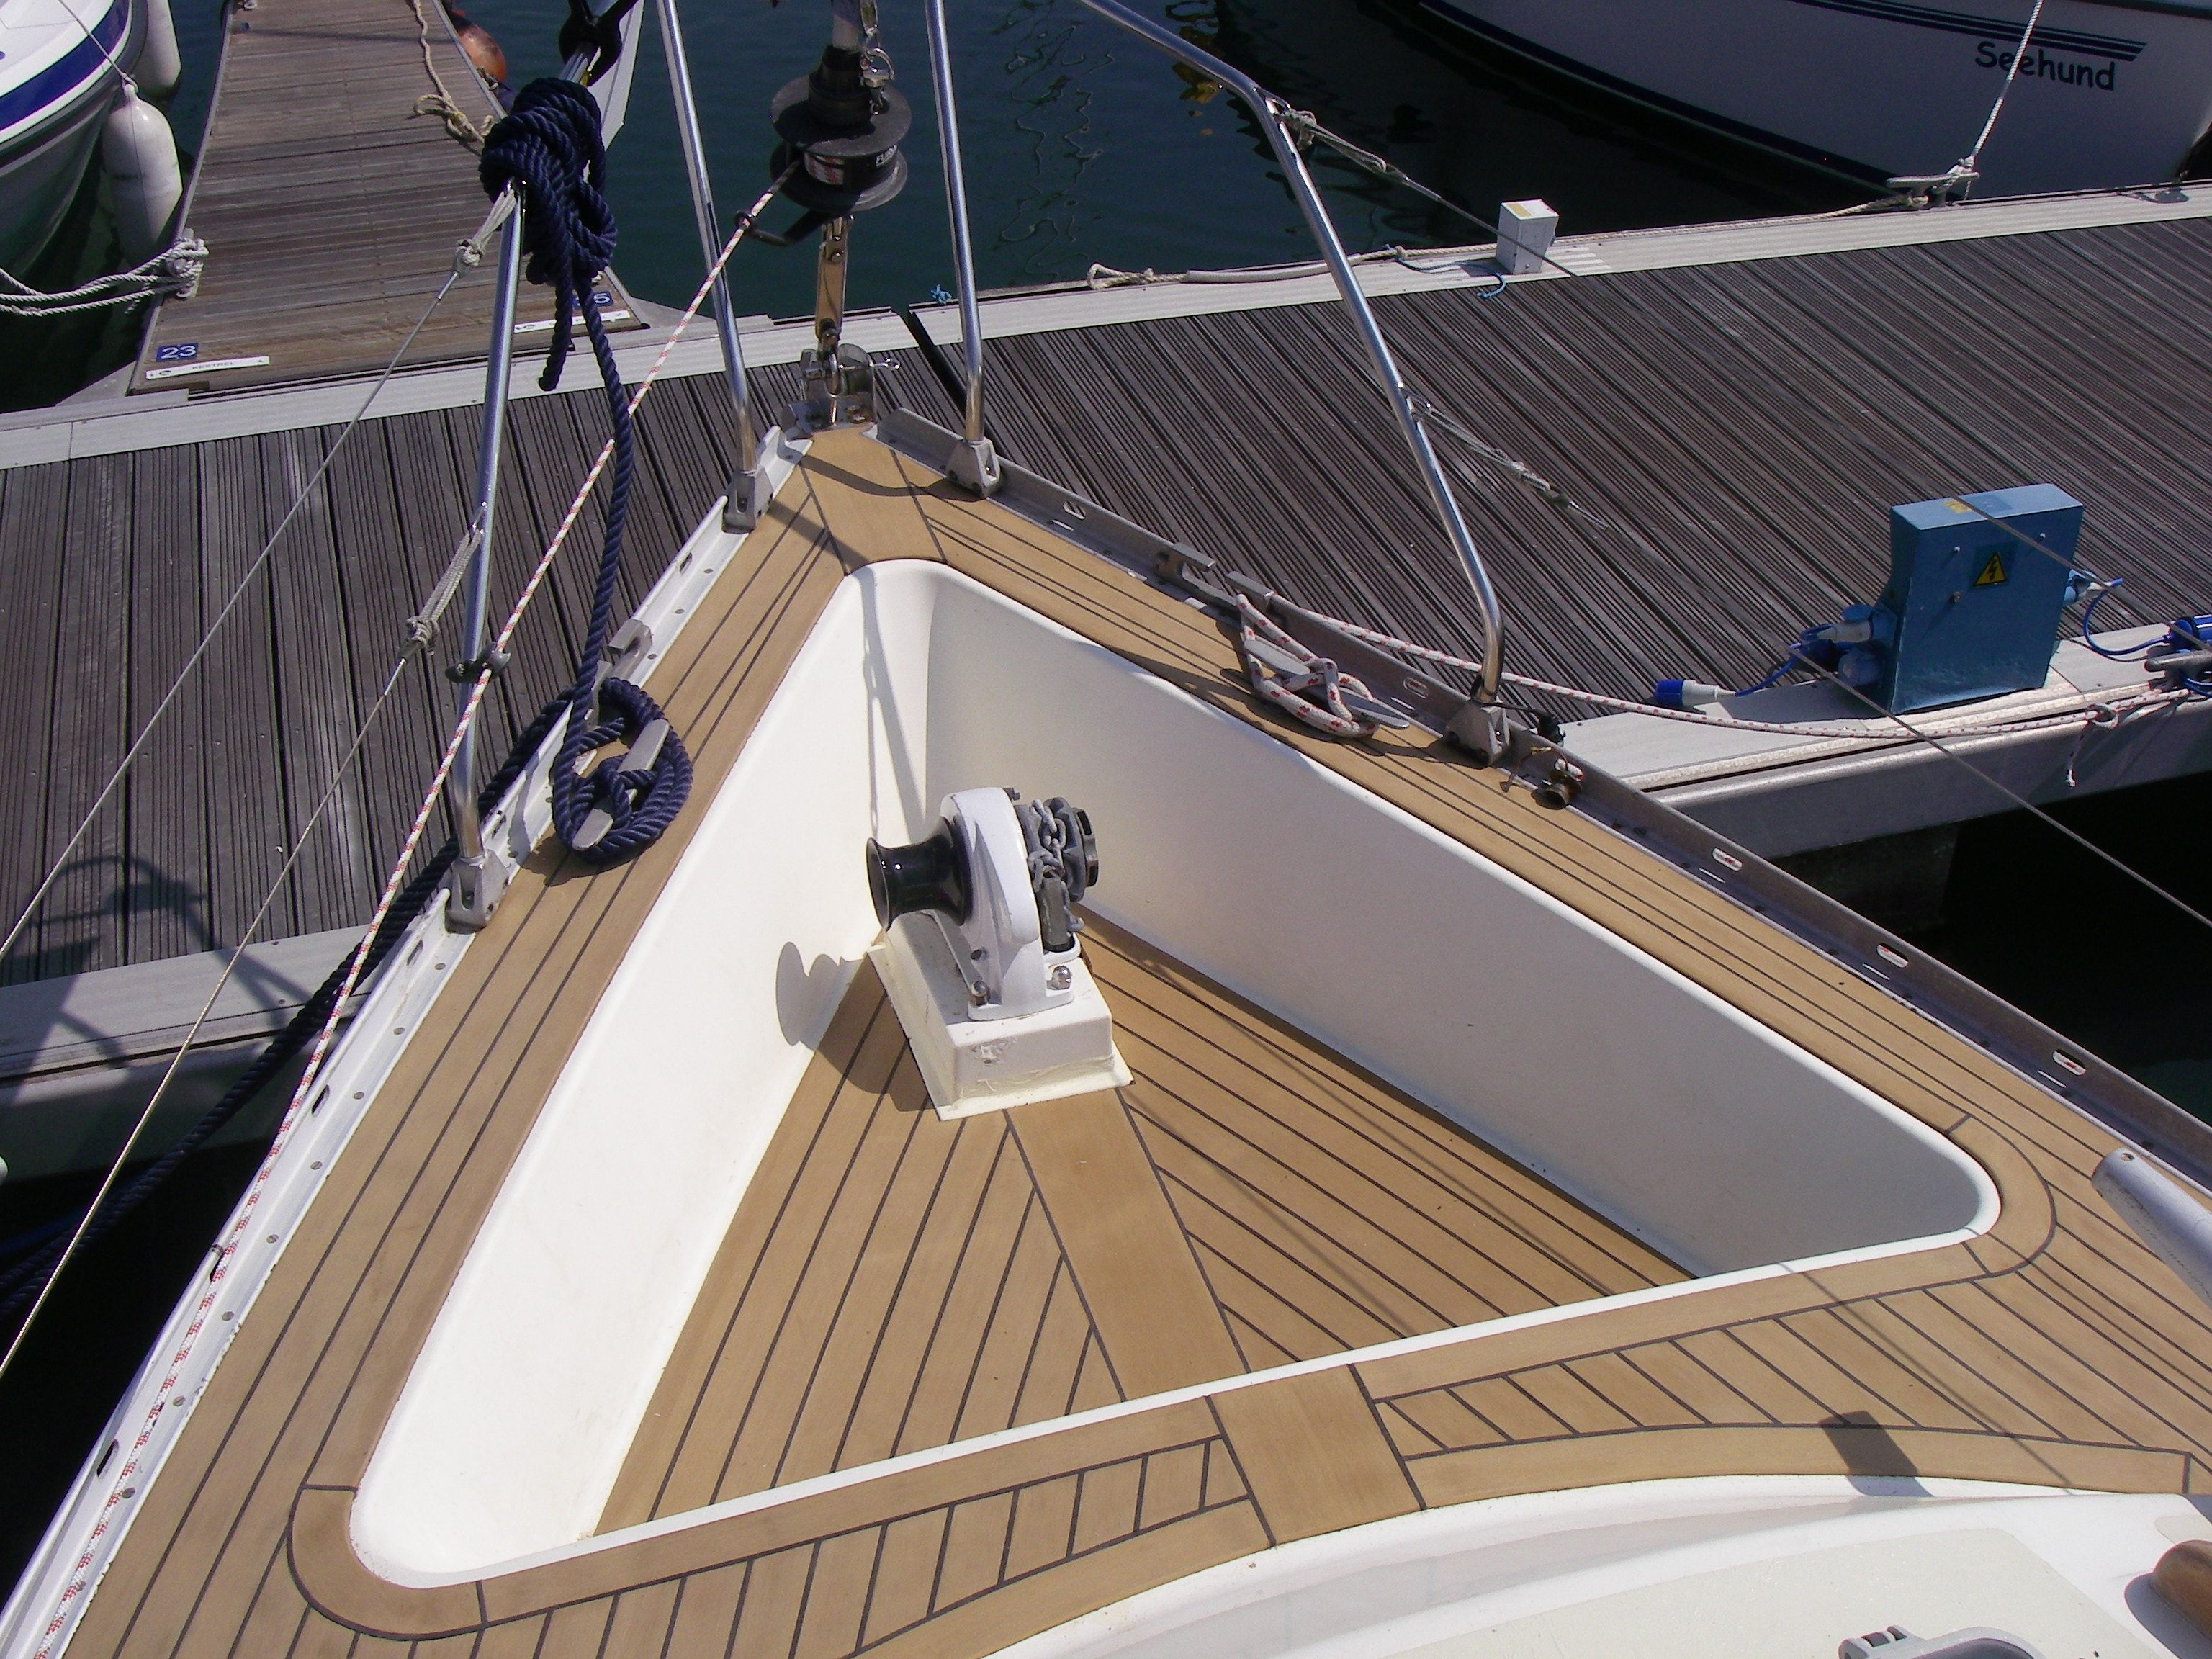 Deck Board For Floor Of Boat , Boat Flooring Options